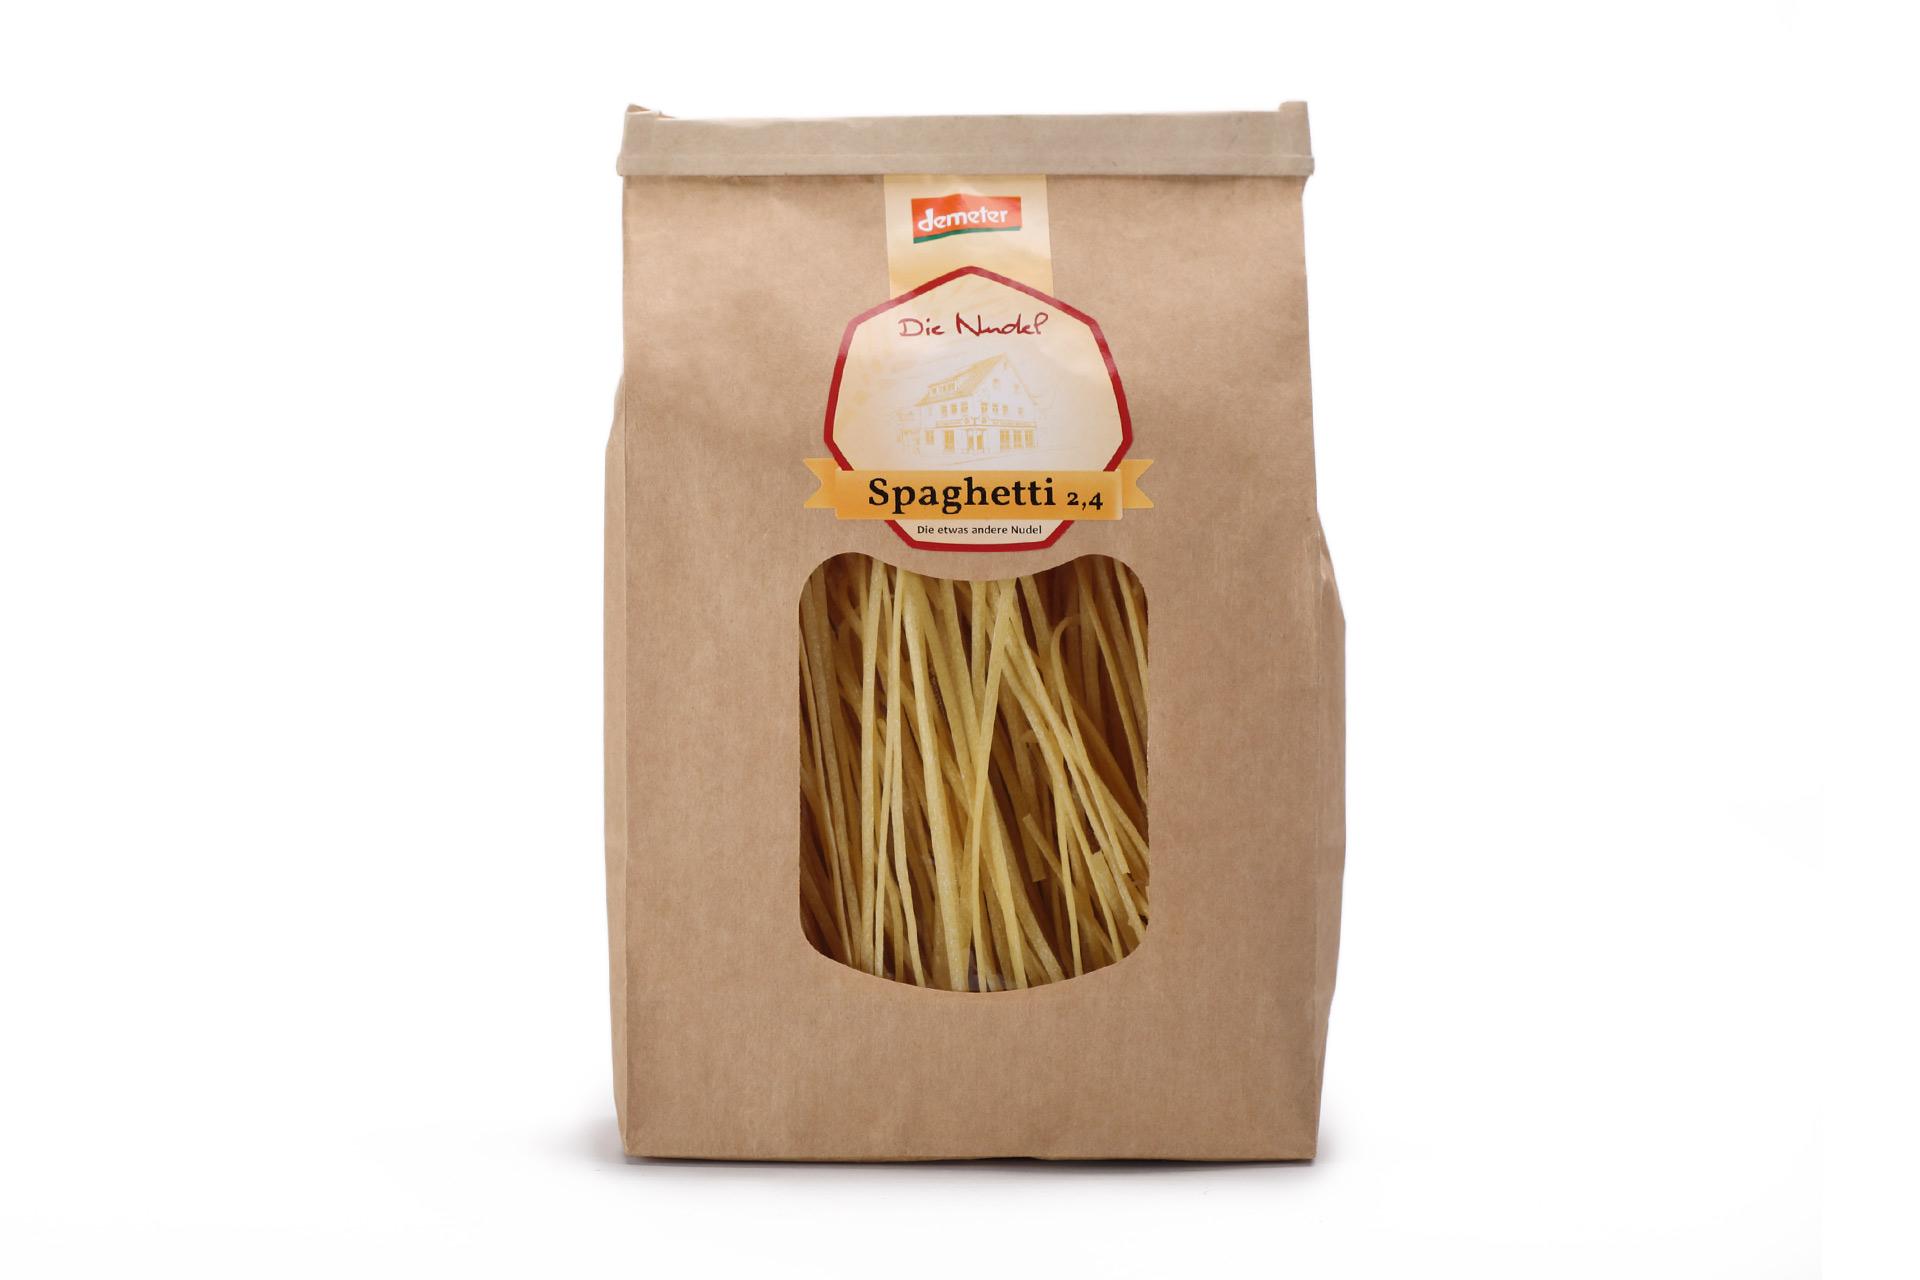 Spaghetti-24-Hartweizengriess-bio-Verpackung-ksg